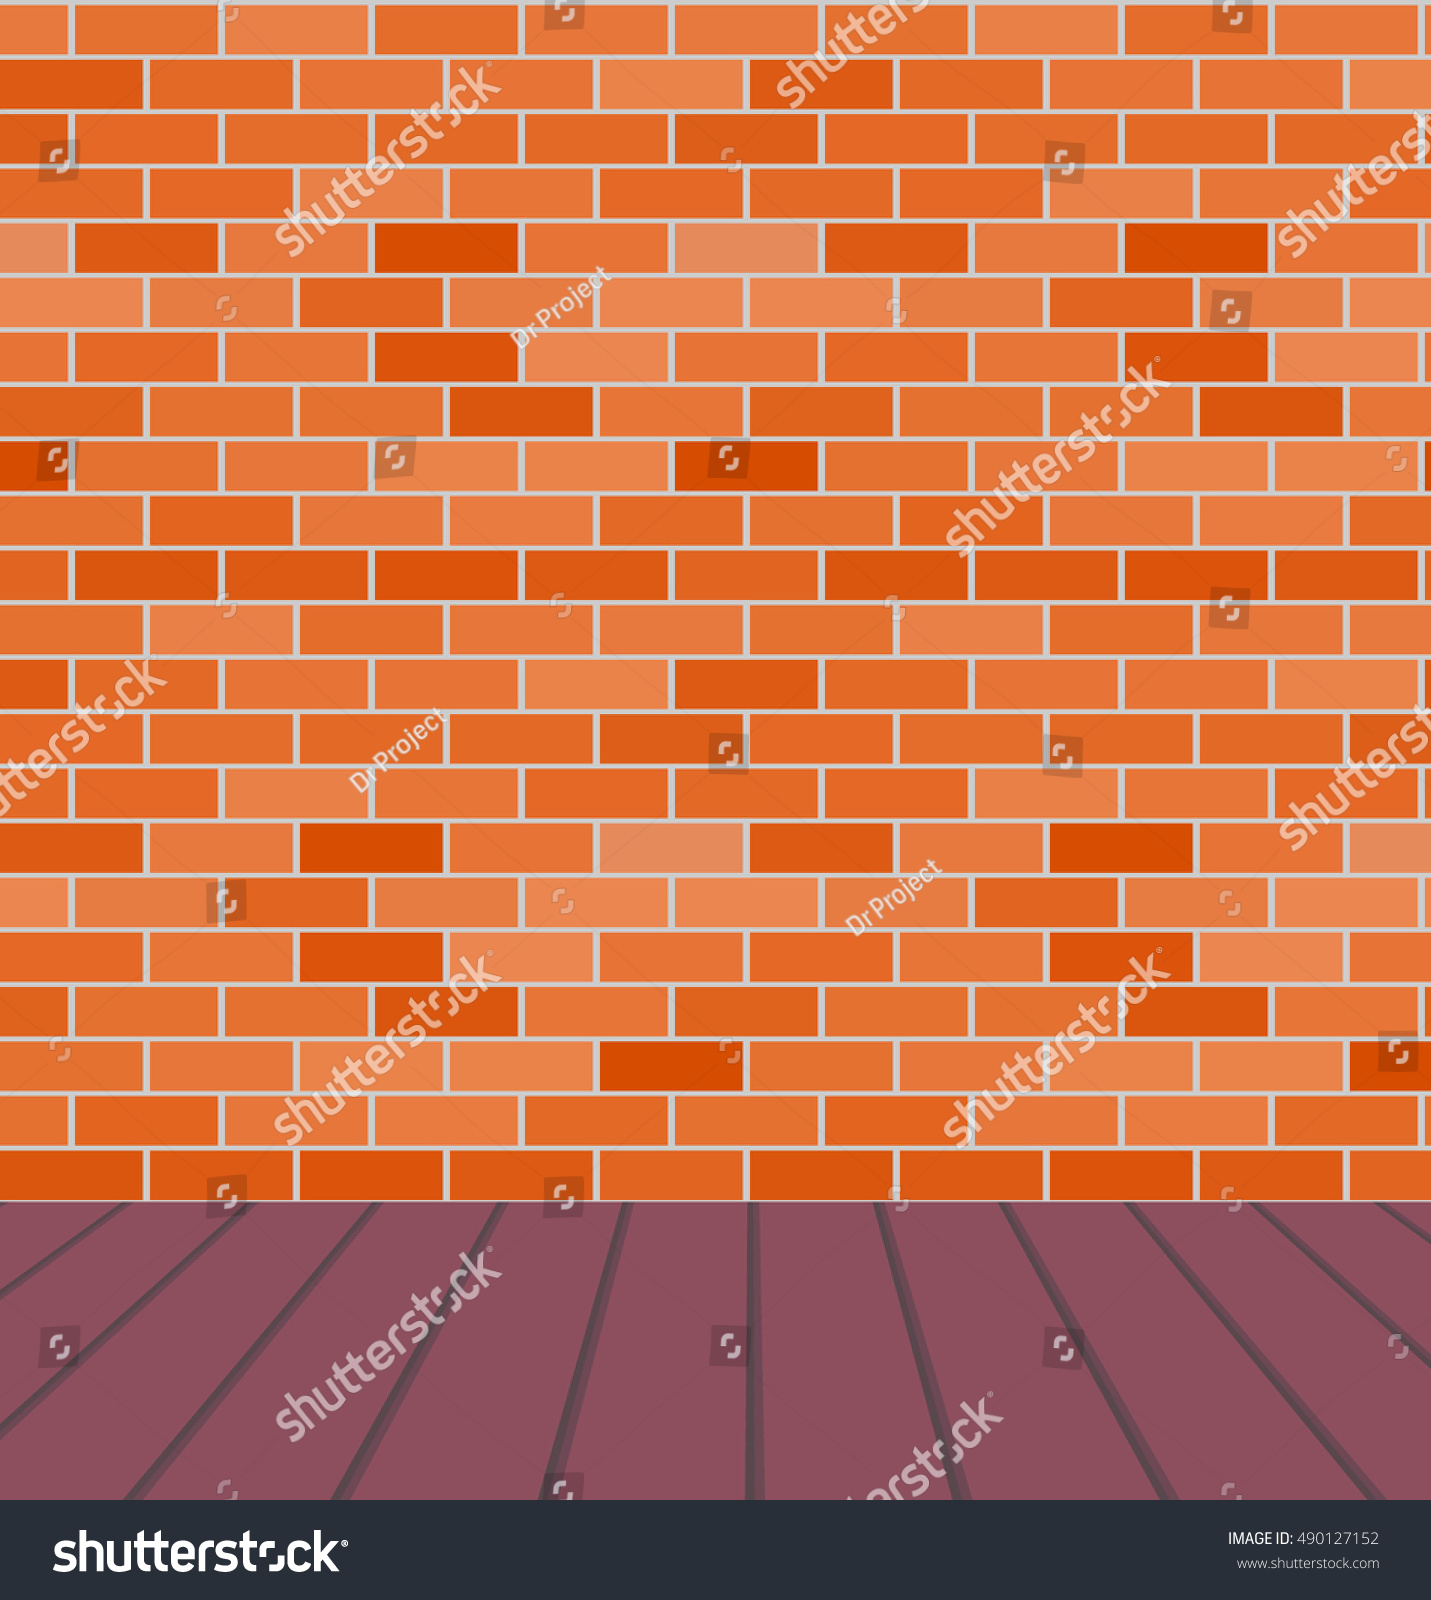 empty room with orangebrown brick wall and wood floor vector background